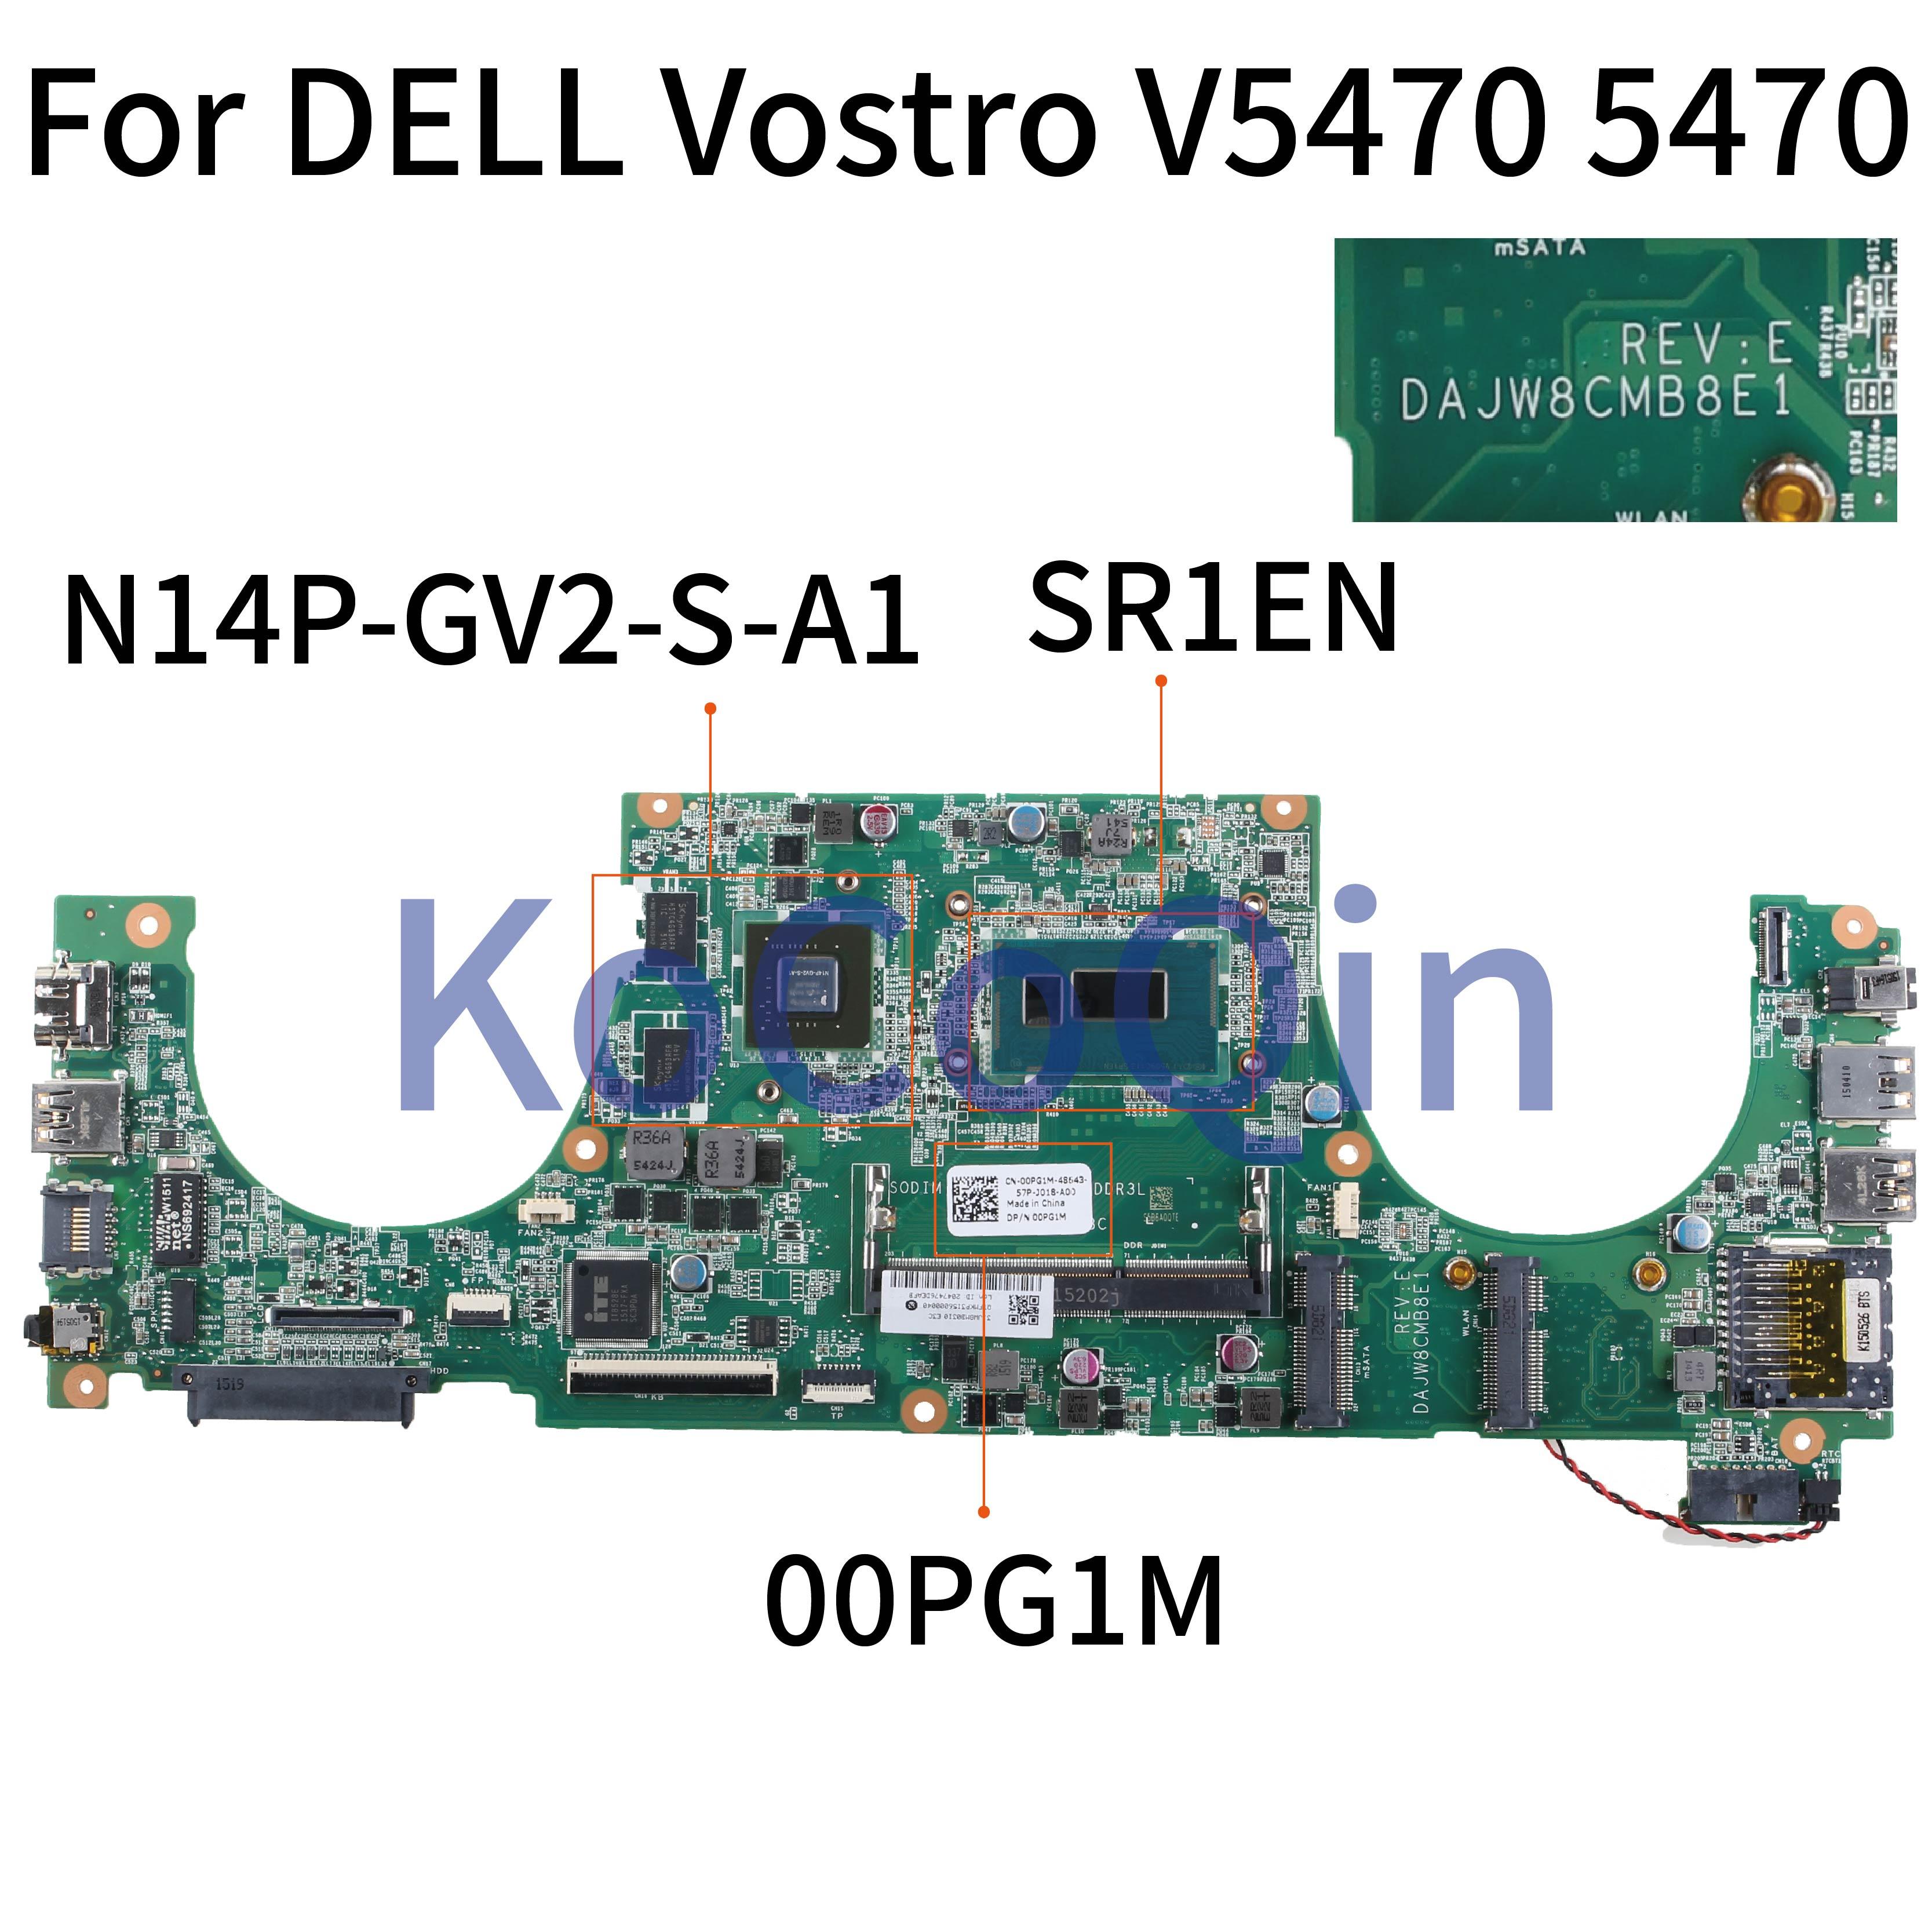 KoCoQin Laptop motherboard For DELL Vostro 5470 V5470 Core I3 SR1EN Mainboard CN-00PG1M 00PG1M DAJW8CMB8E1 N14P-GV2-S-A1